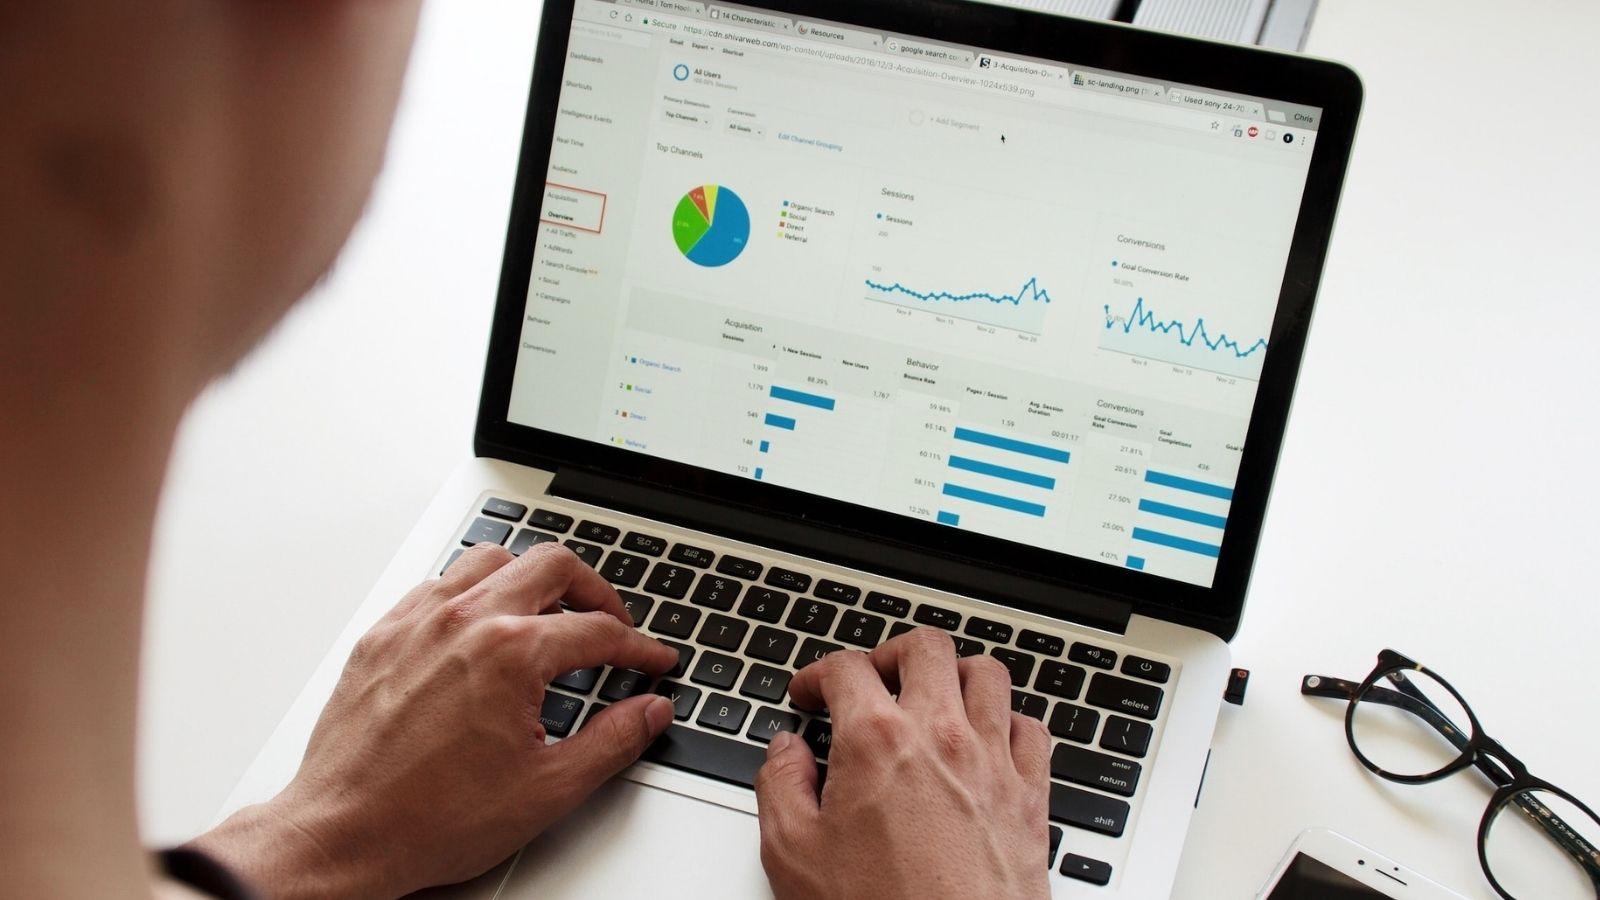 18% mniej na kampanie online w IV kwartale! [RAPORT] Technologie mediarun spadek